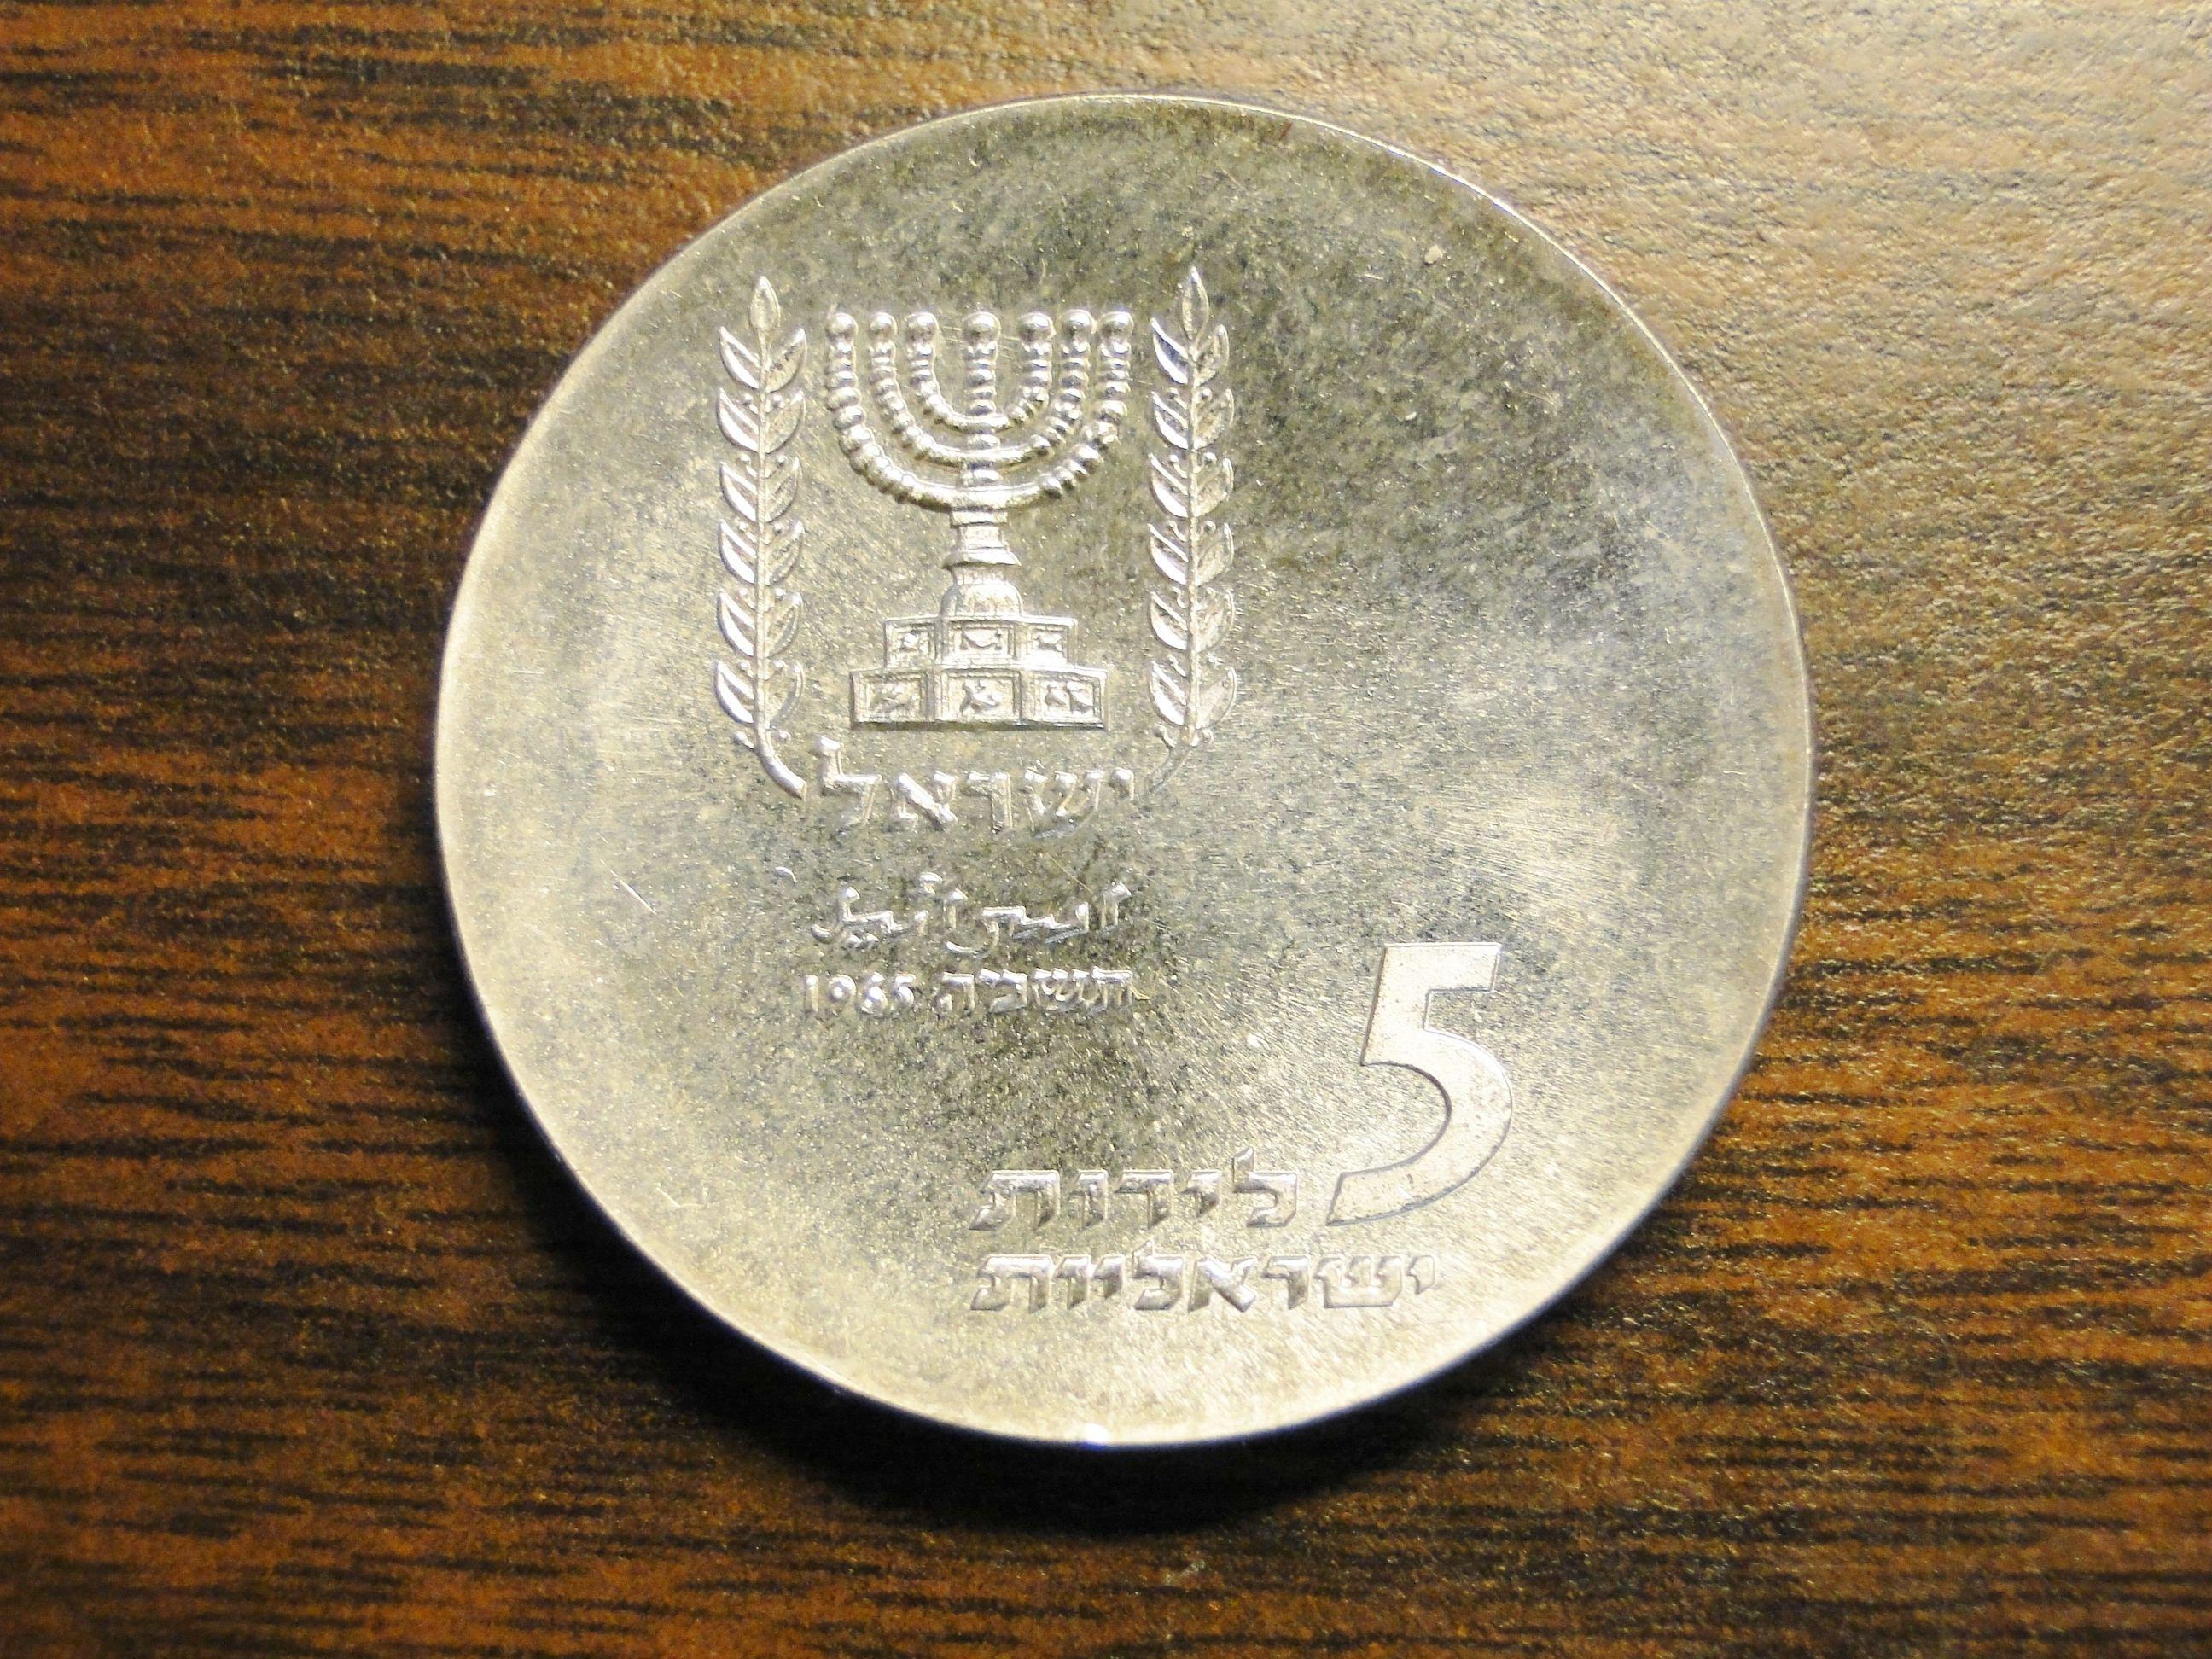 israel coins worth money